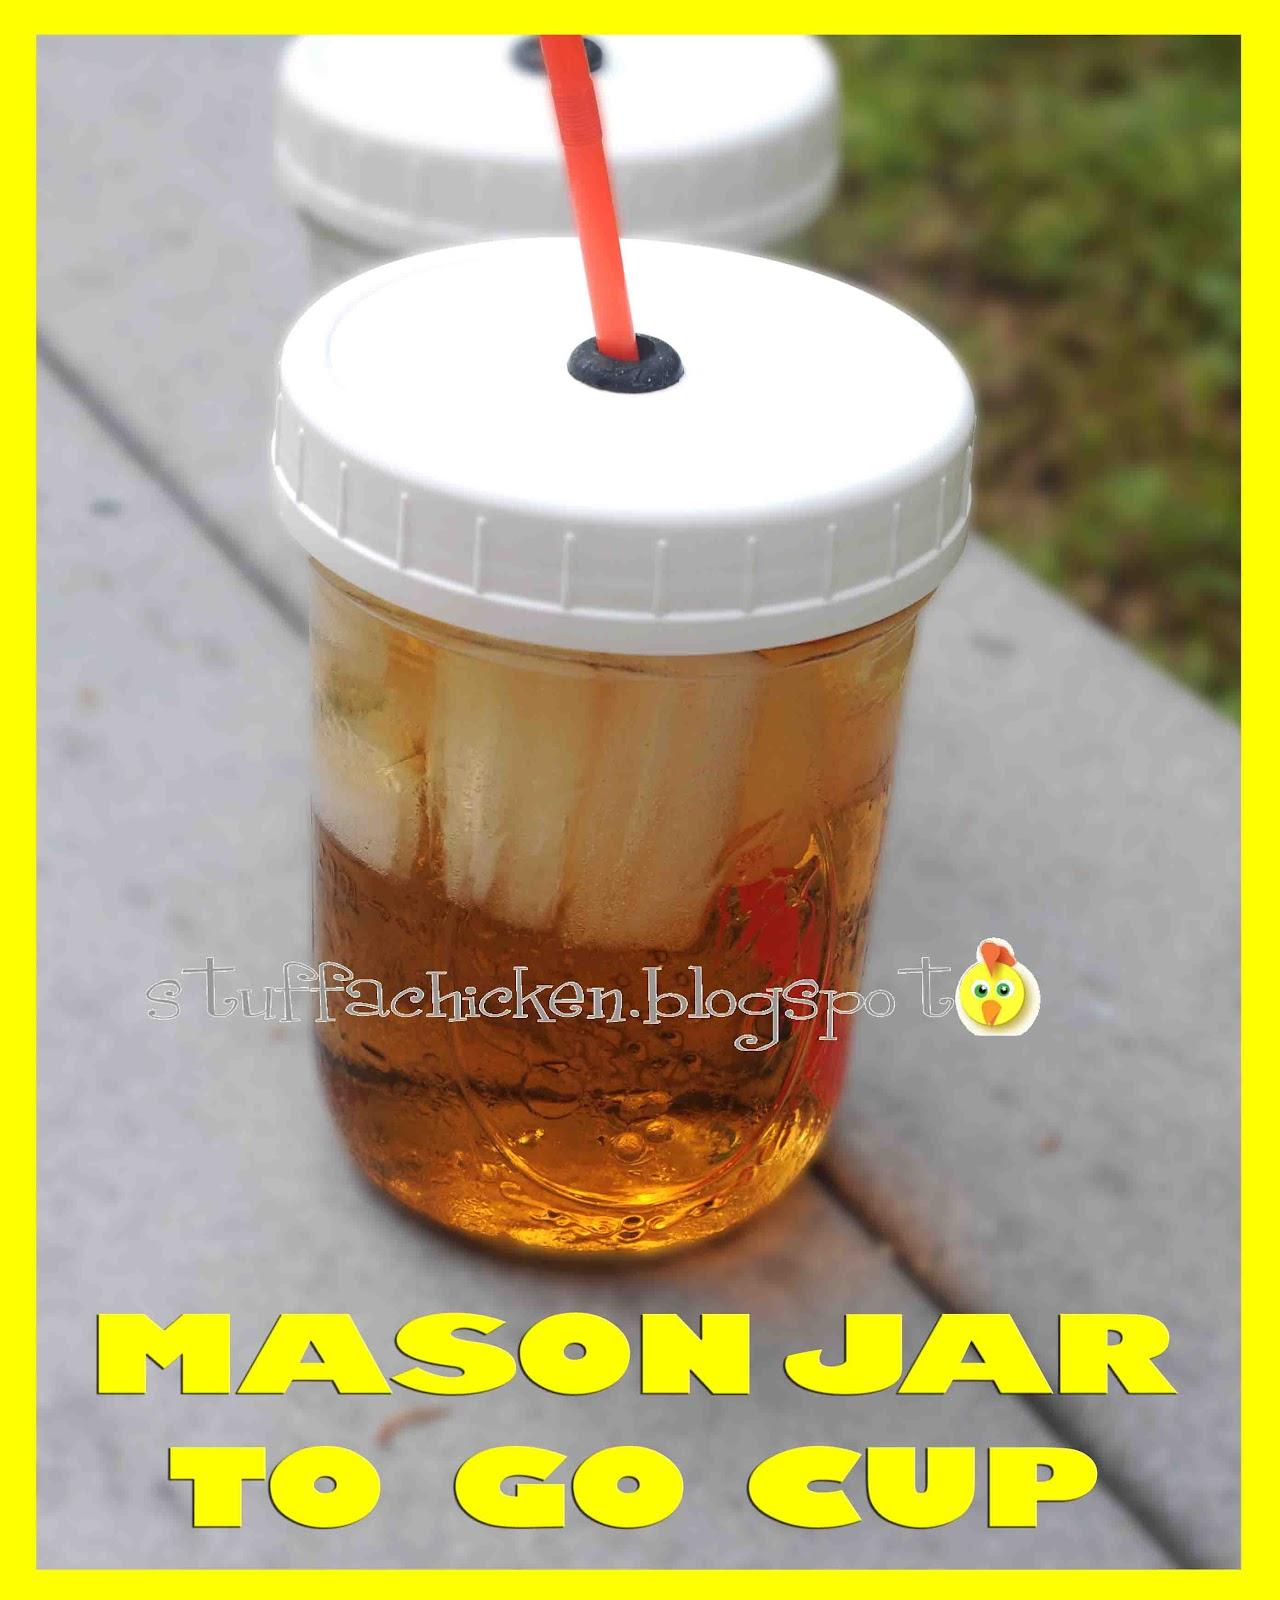 Mason Jar To-Go Cup